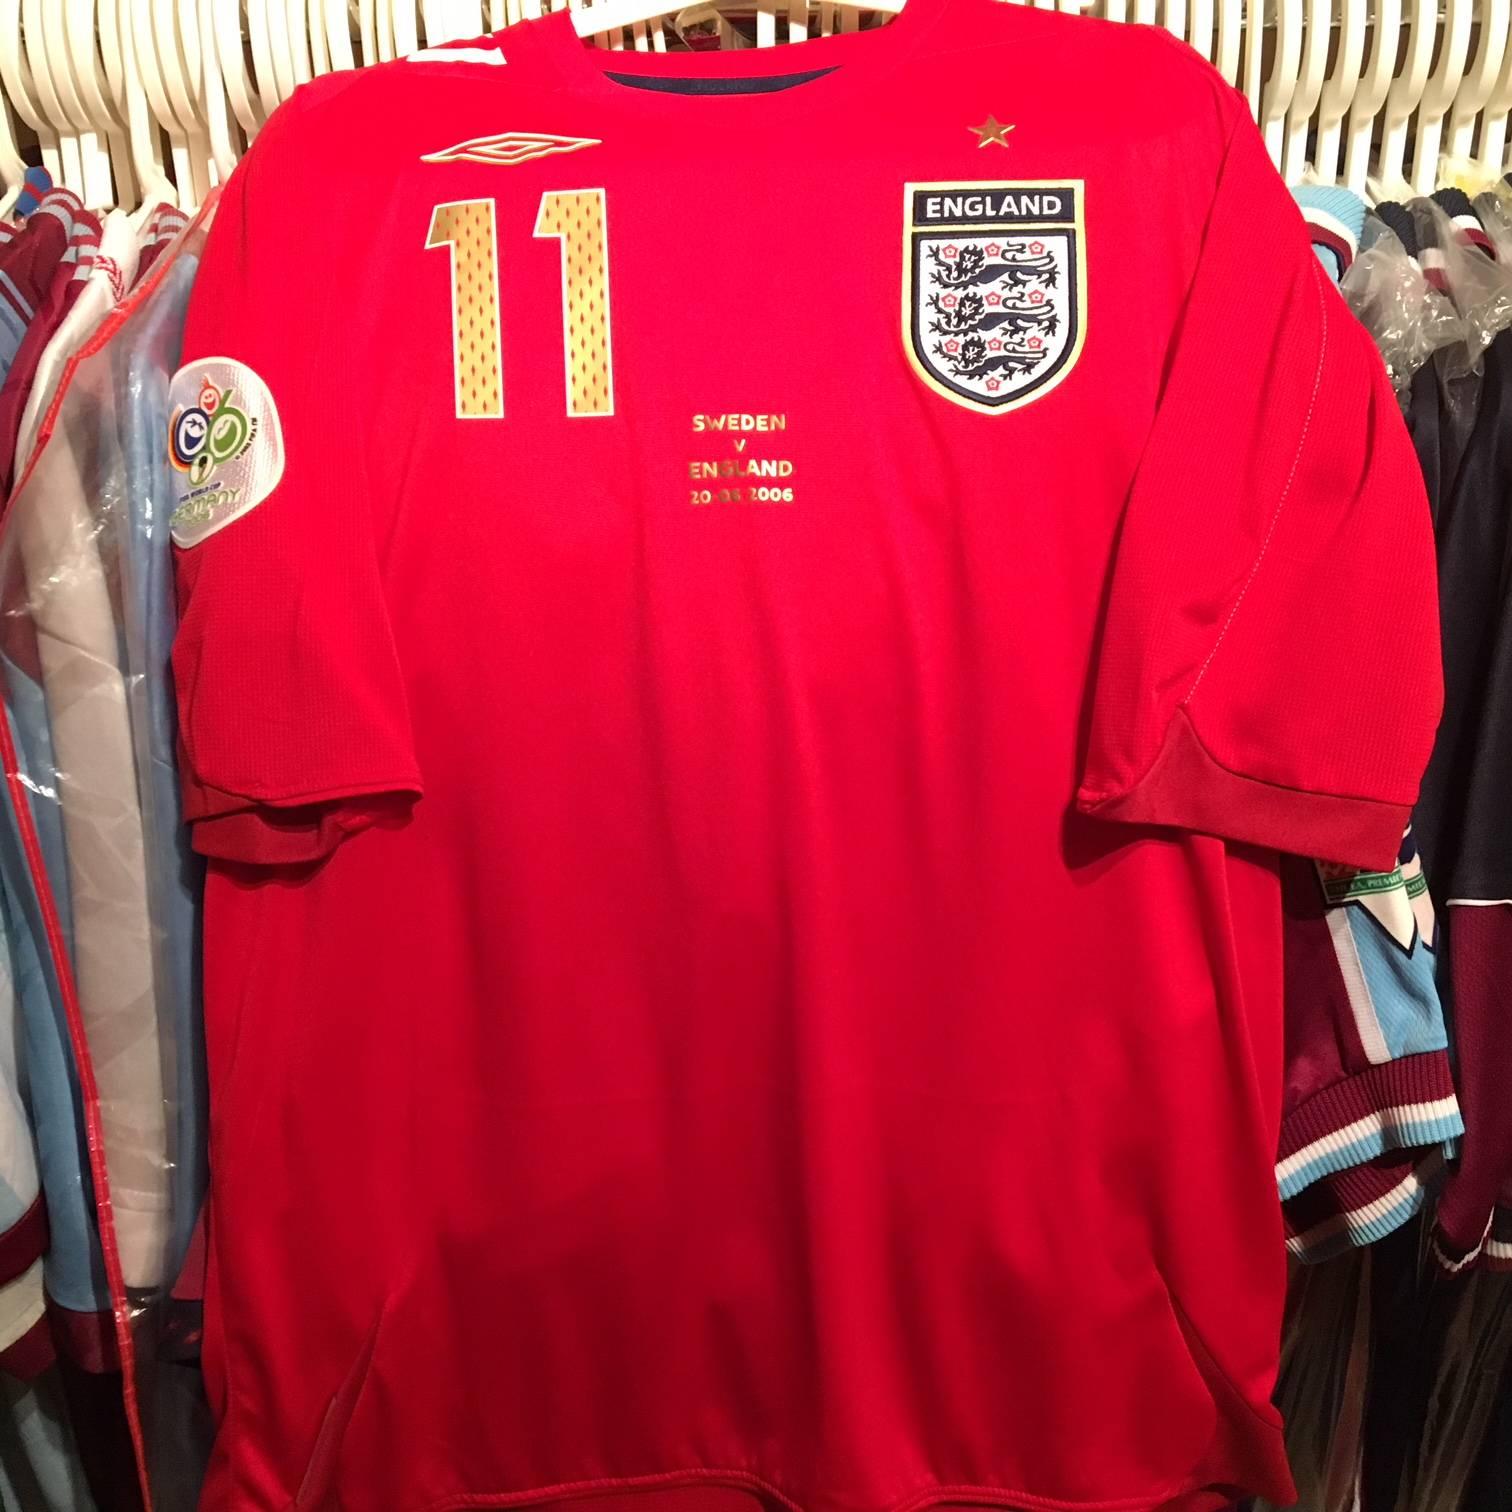 Worn Joe Cole 2006 World Cup England shirt.